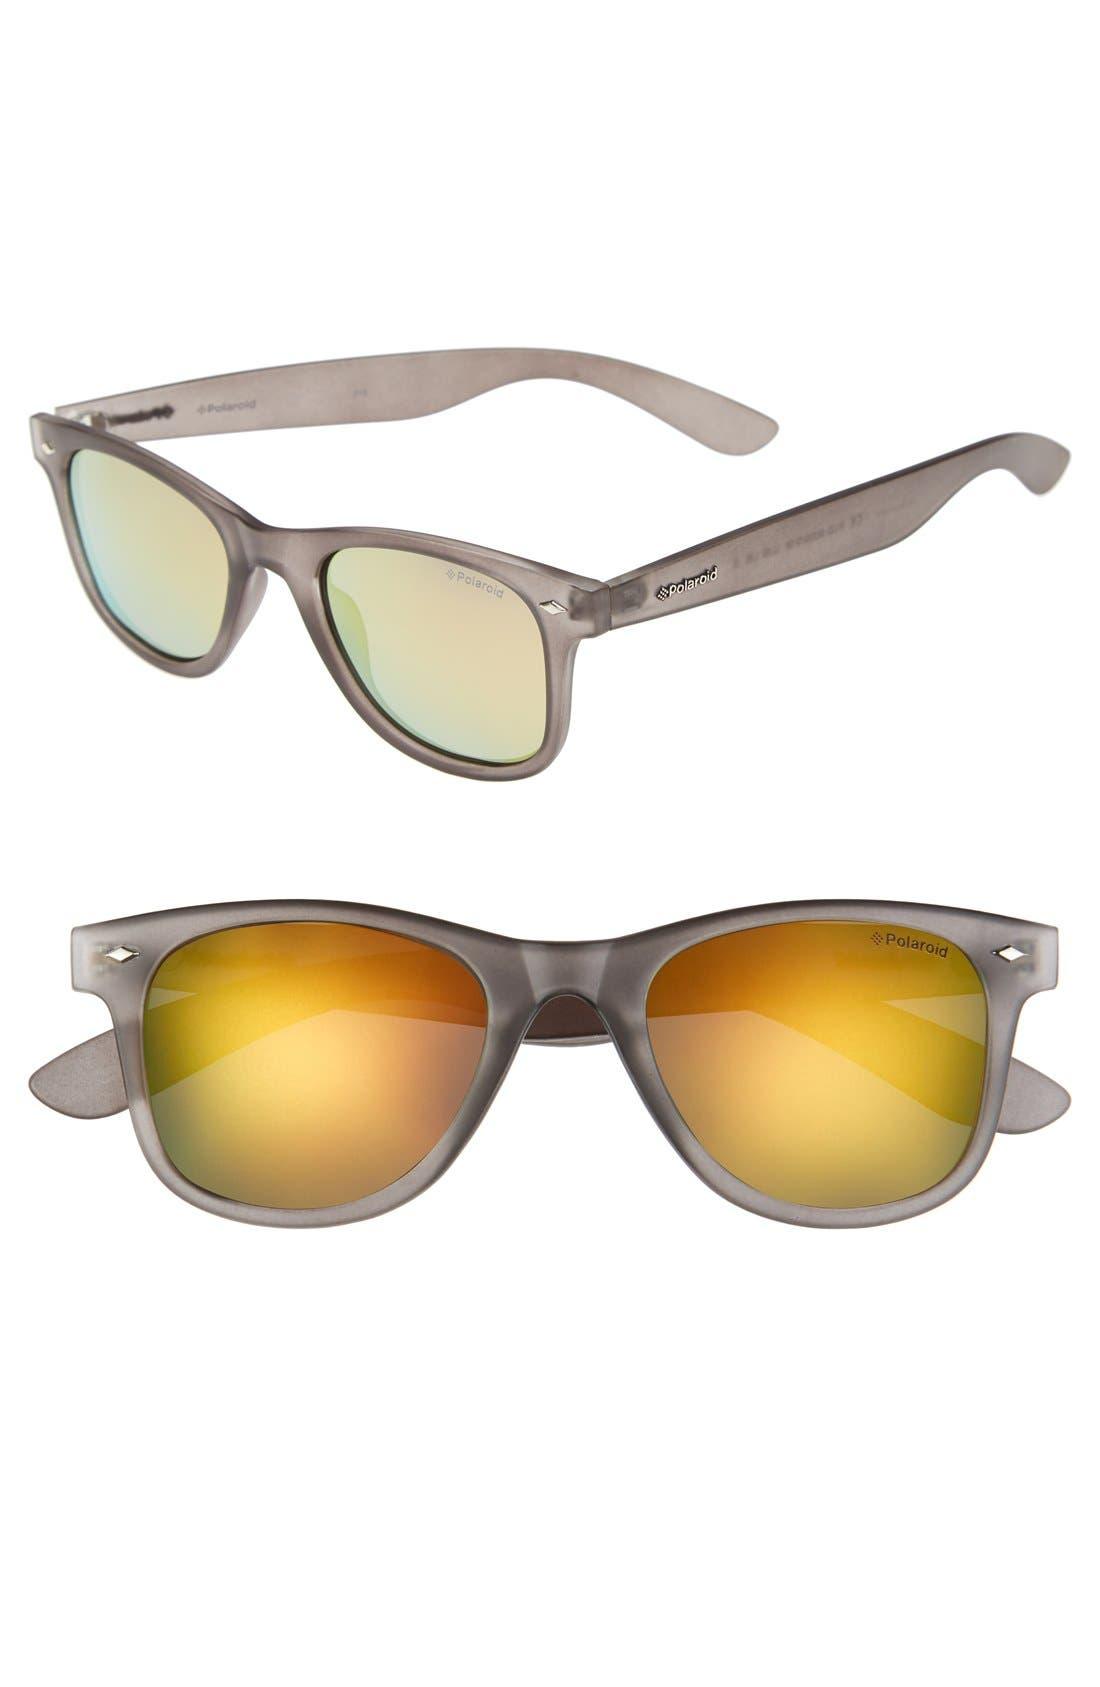 '6009SM' 50mm Polarized Retro Sunglasses,                             Main thumbnail 1, color,